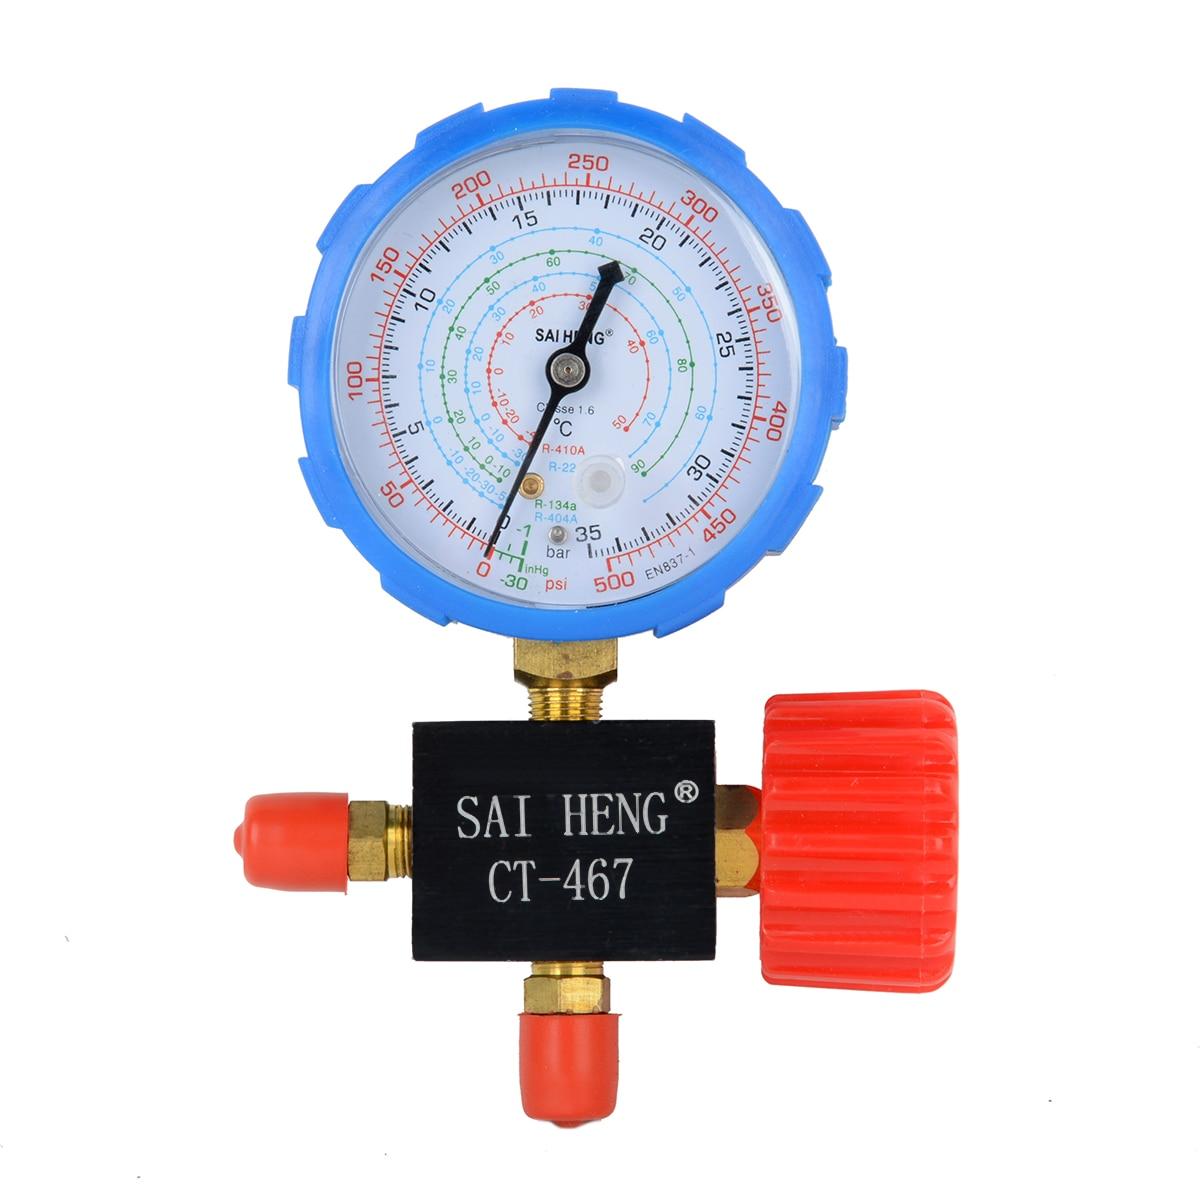 1pc / 2pcs A/C System Air Conditioning Manifold Gauge Mayitr